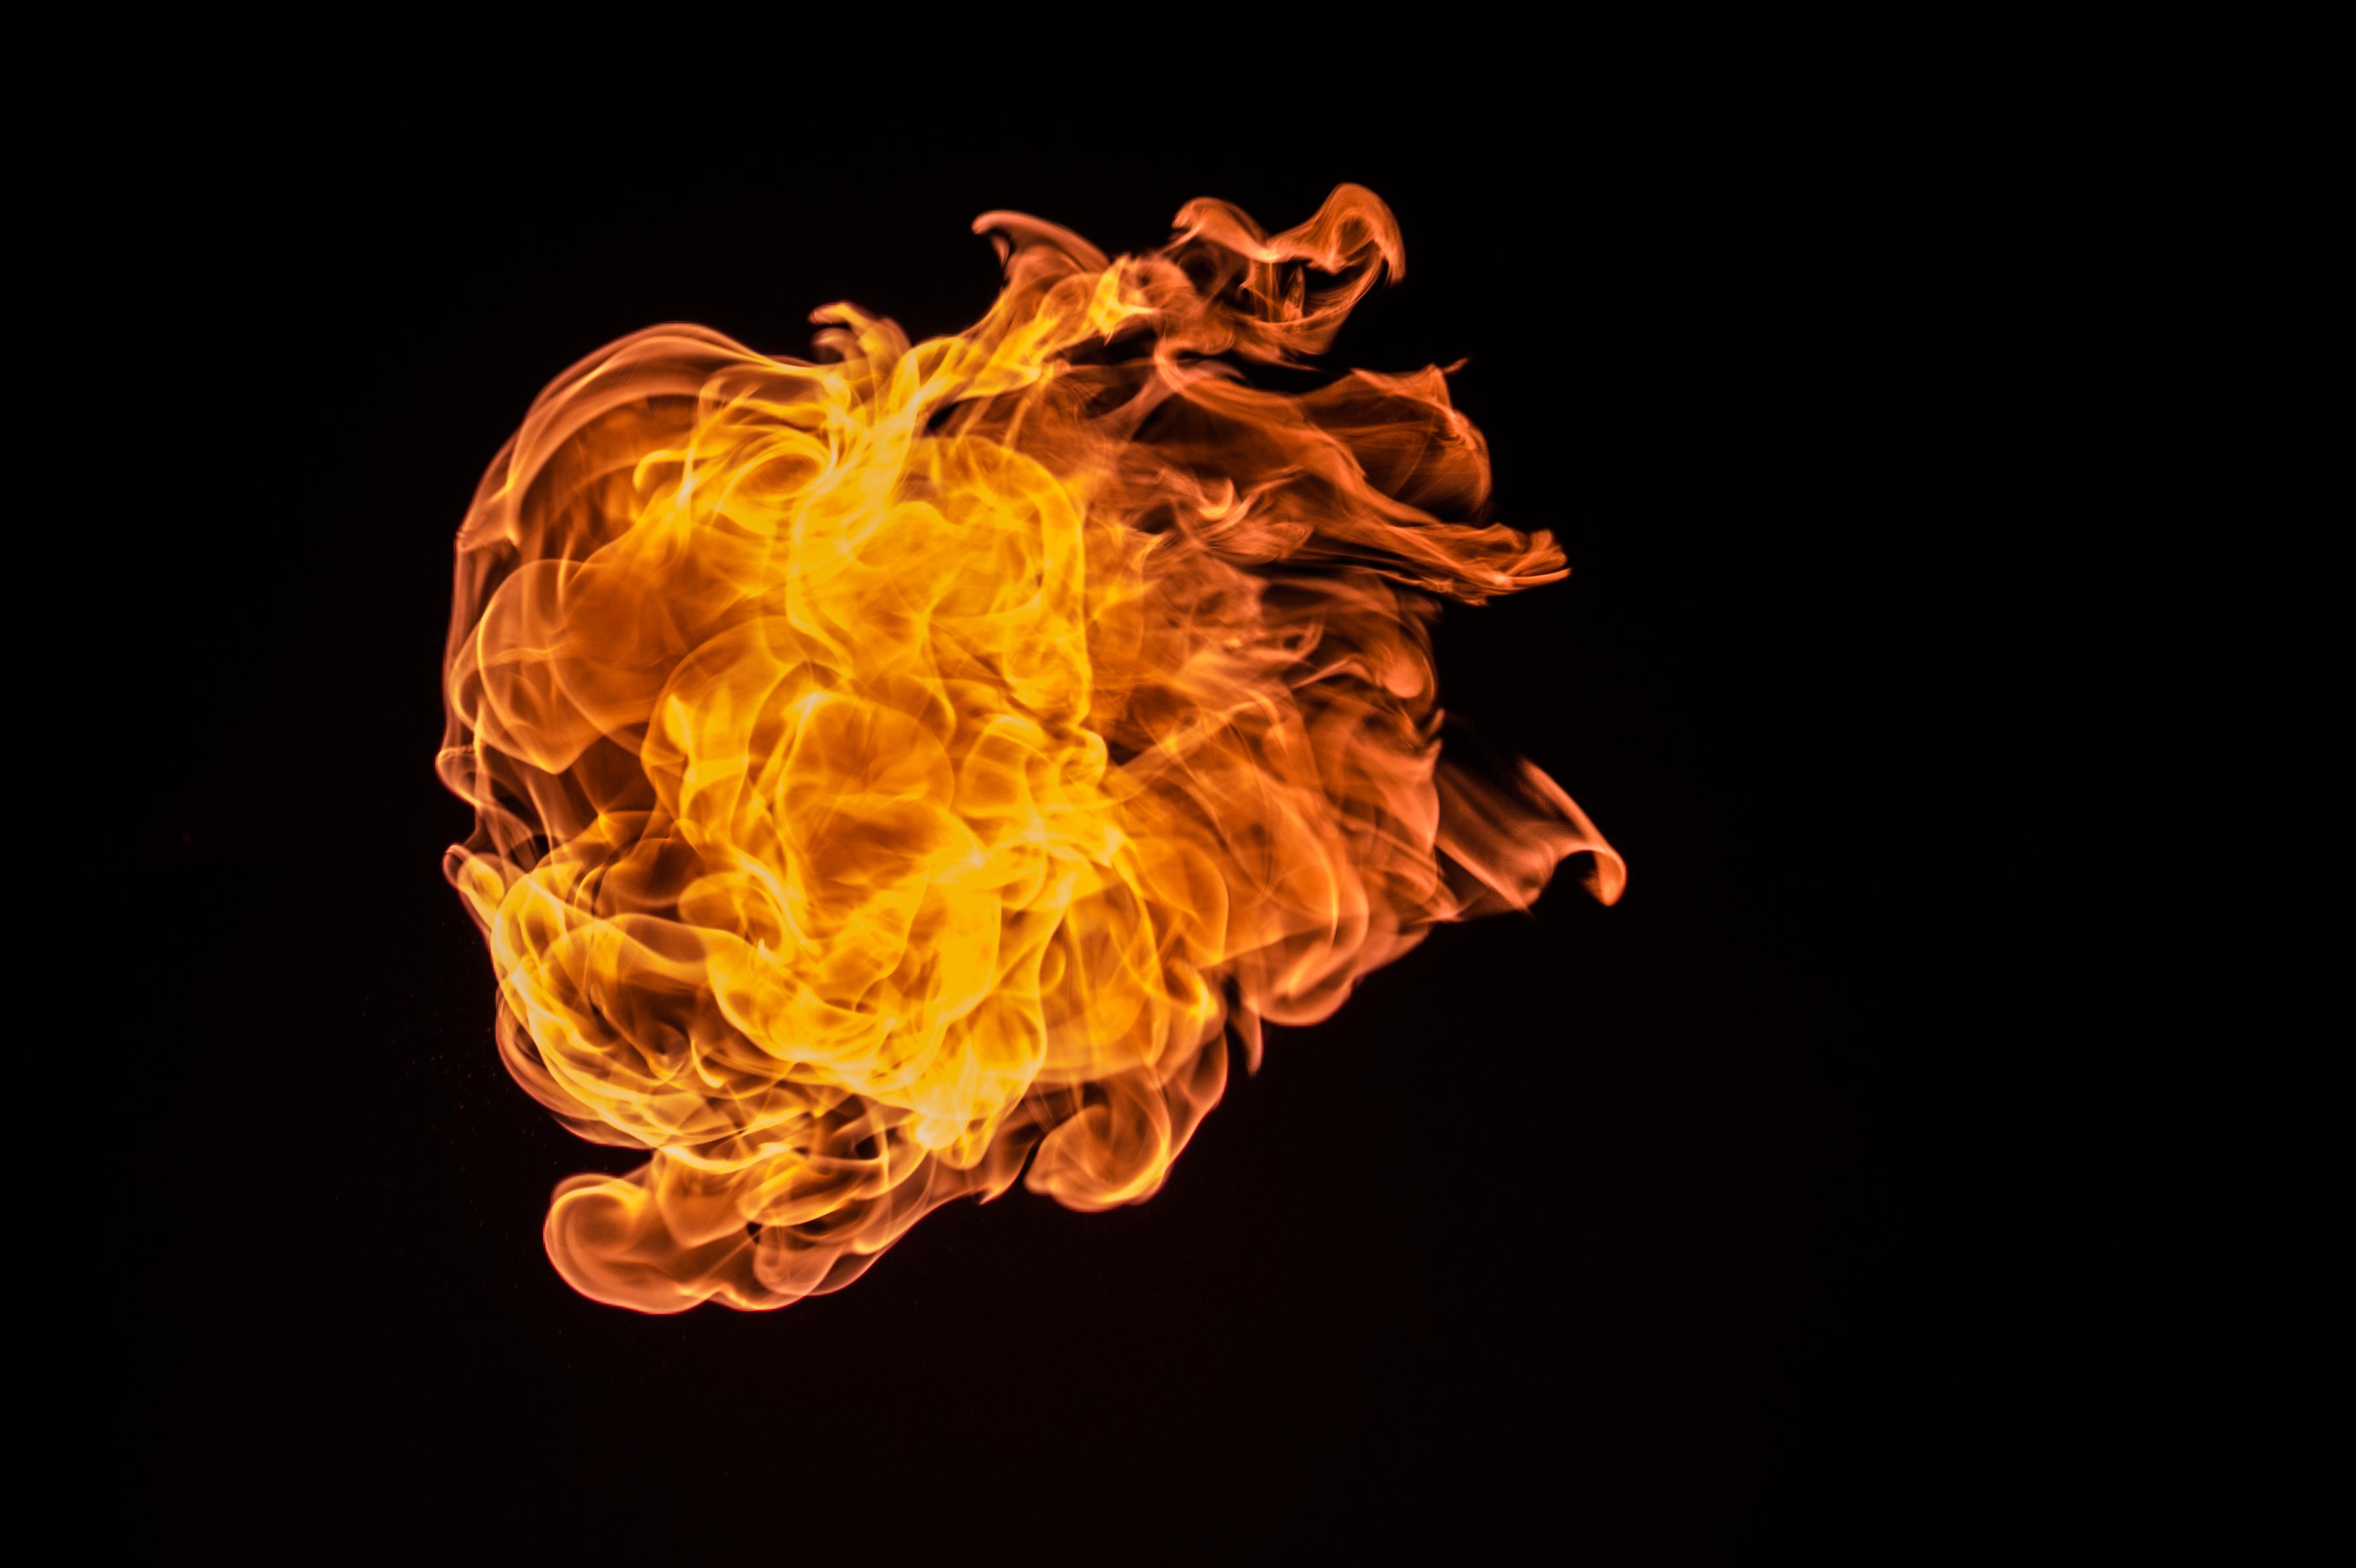 Strange Fire: The Danger of Counterfeit Worship